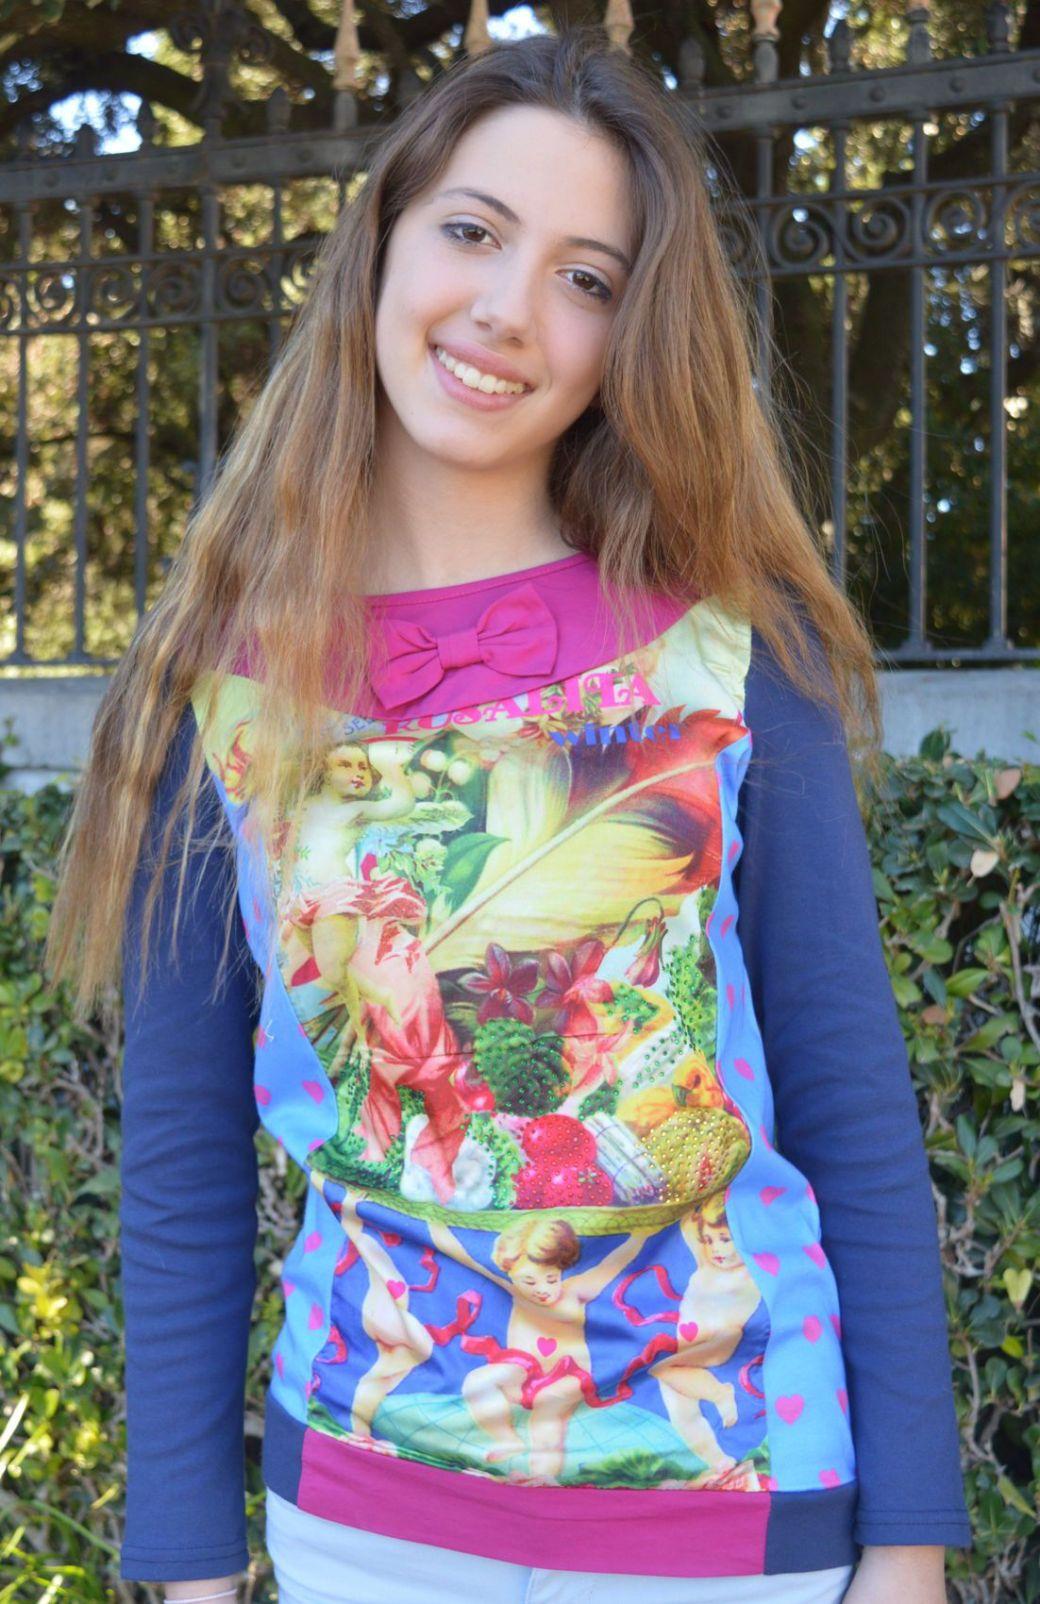 rosalita señoritas moda infantil y juvenil 12